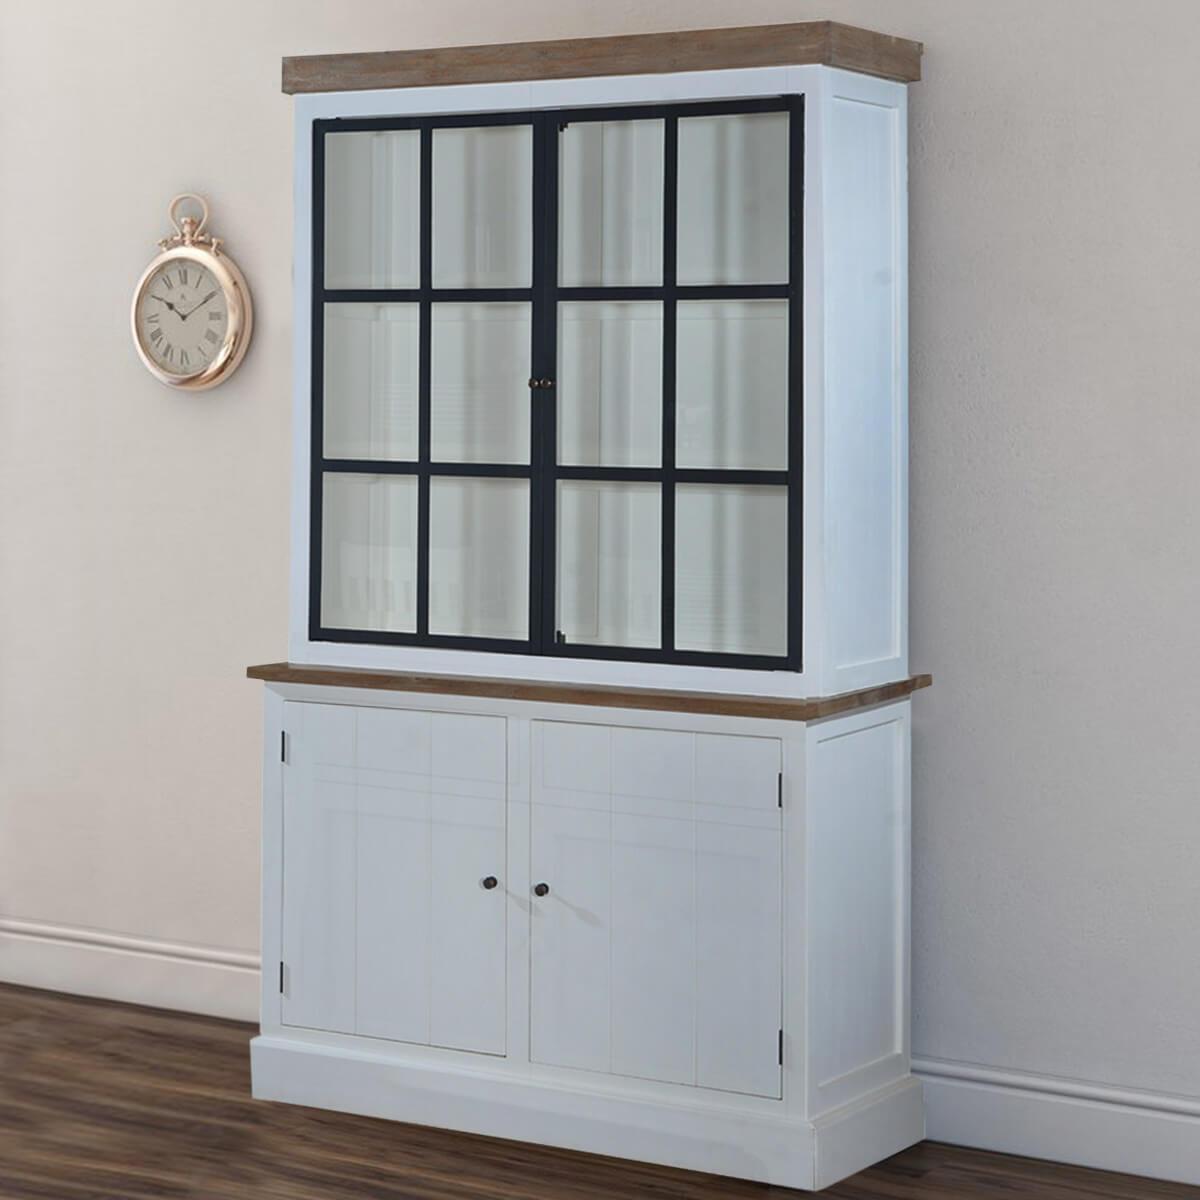 Glasgow Stylish Teak & Solid Wood Glass Door Dining Room White Hutch